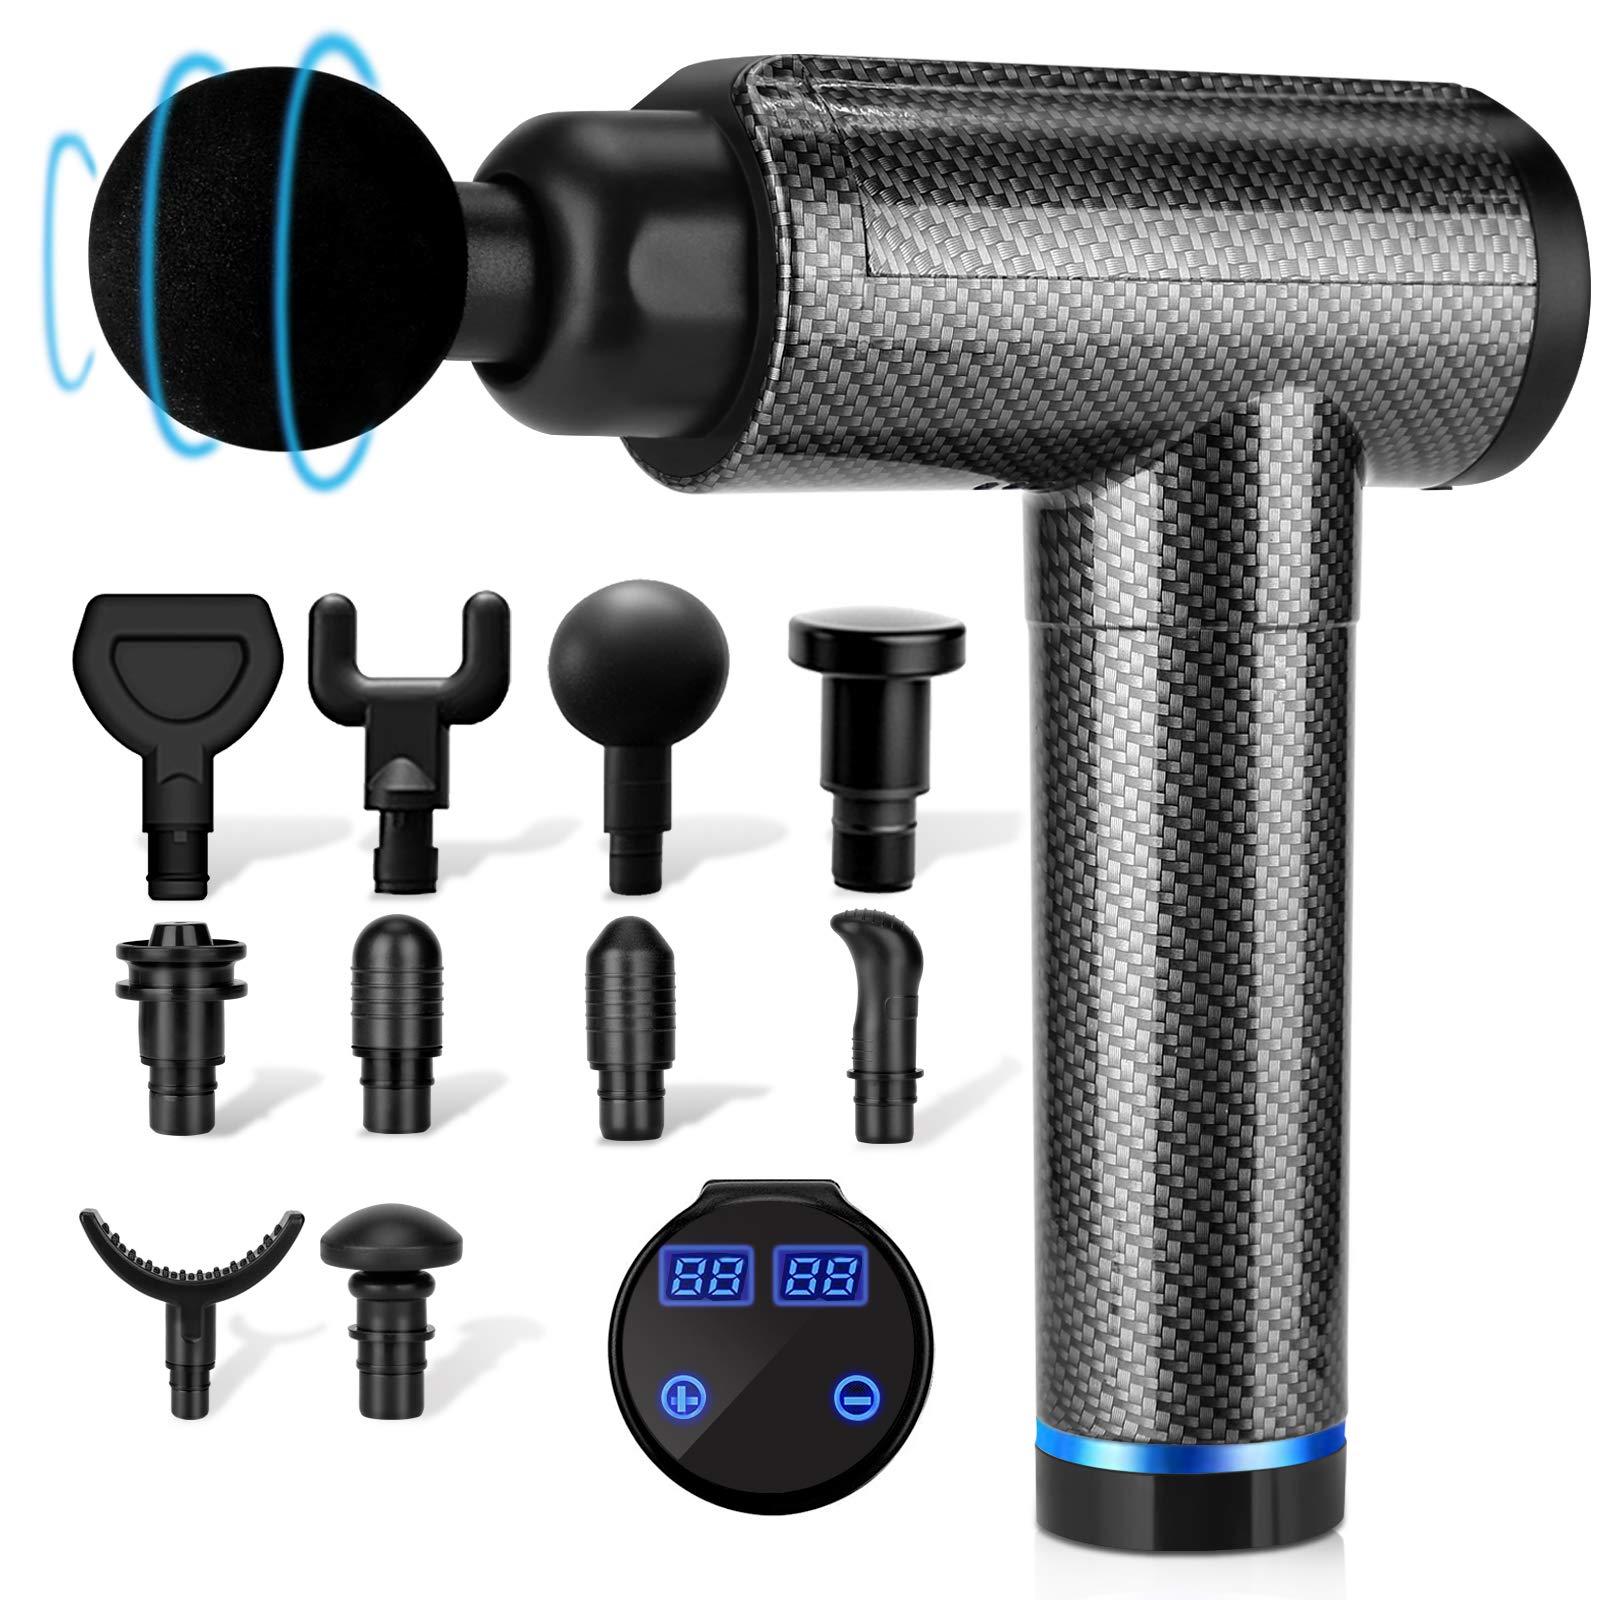 Muscle Massage Gun, Percussion Massage Gun Deep Tissue for Athletes, 30 Speeds Quiet Handheld Massager, LCD Touch Screen with 10 Head